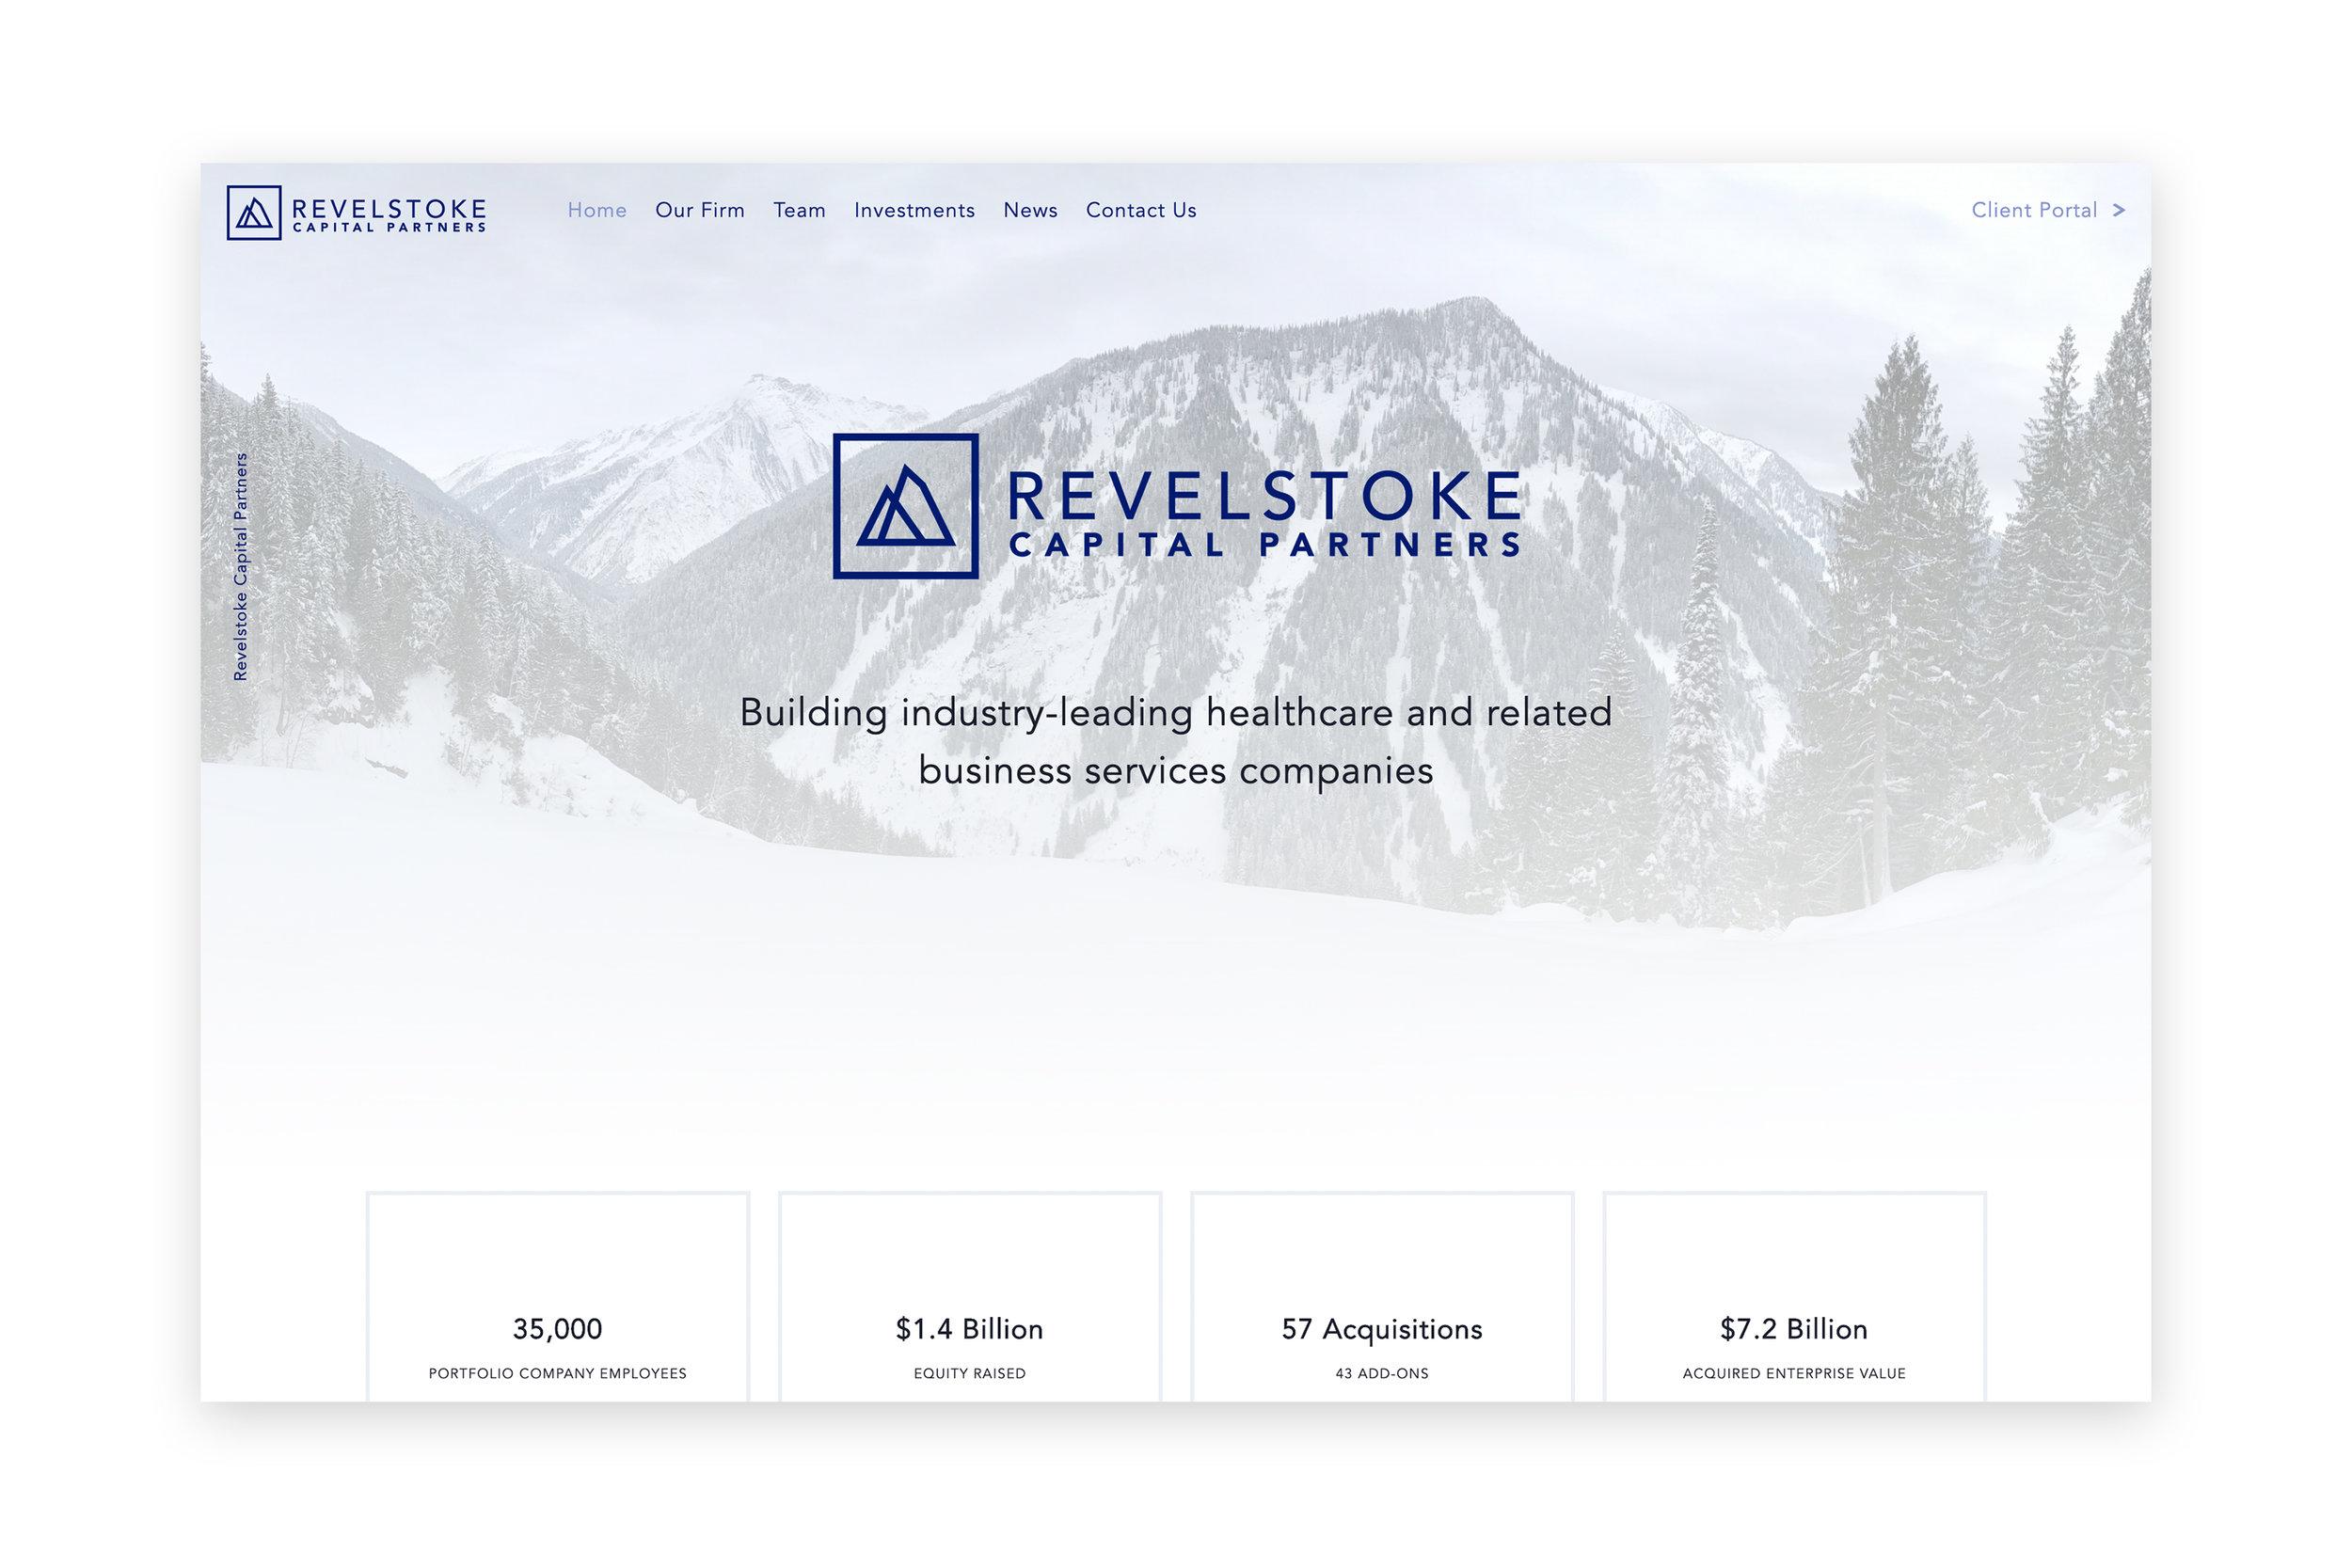 Revelstoke-screenshots-gallery1.jpg